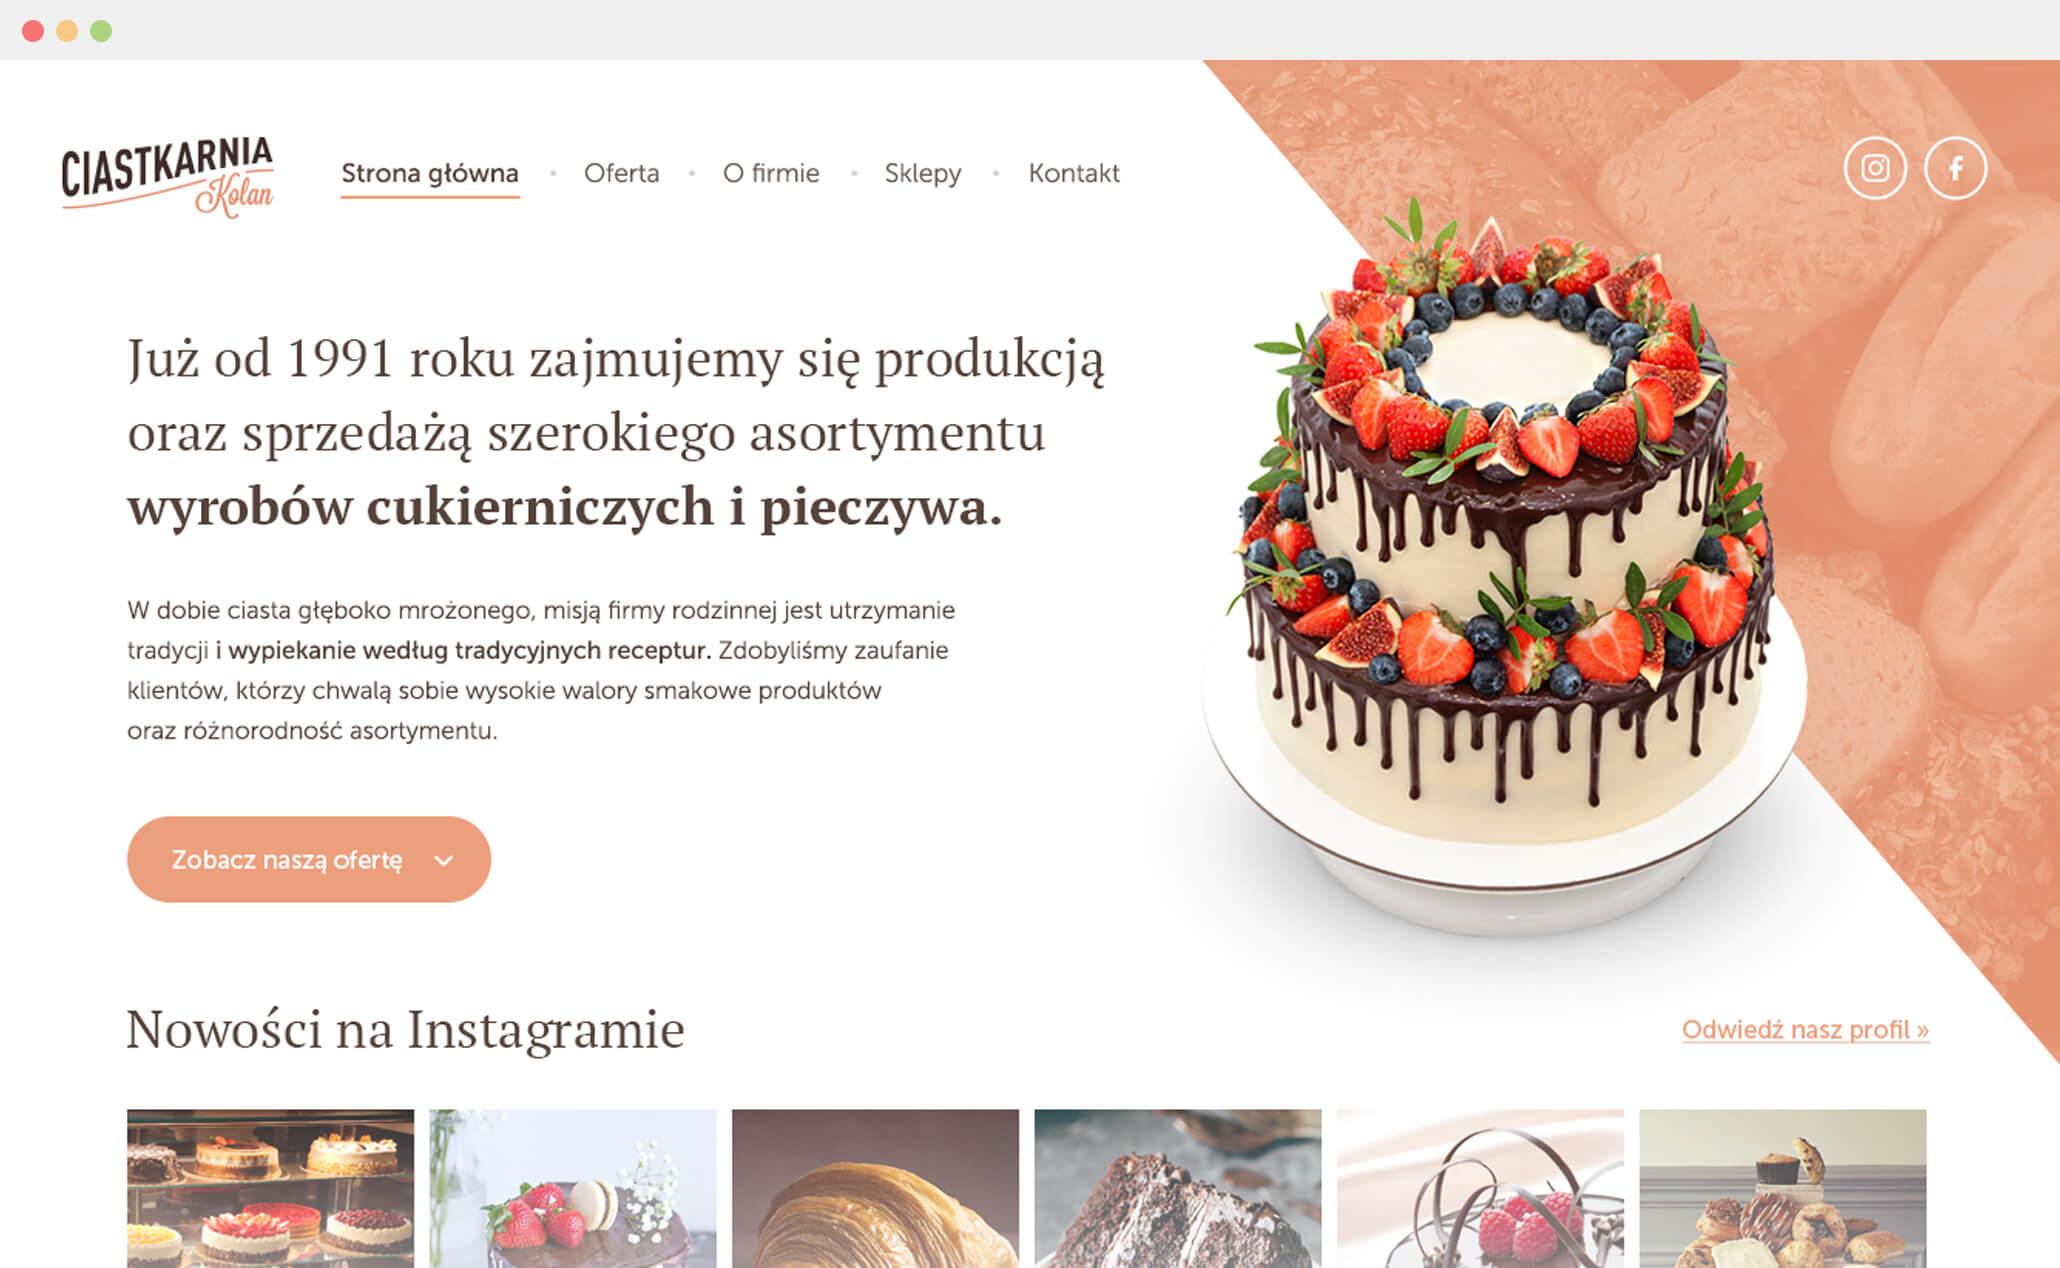 Ciastkarnia Kolan website